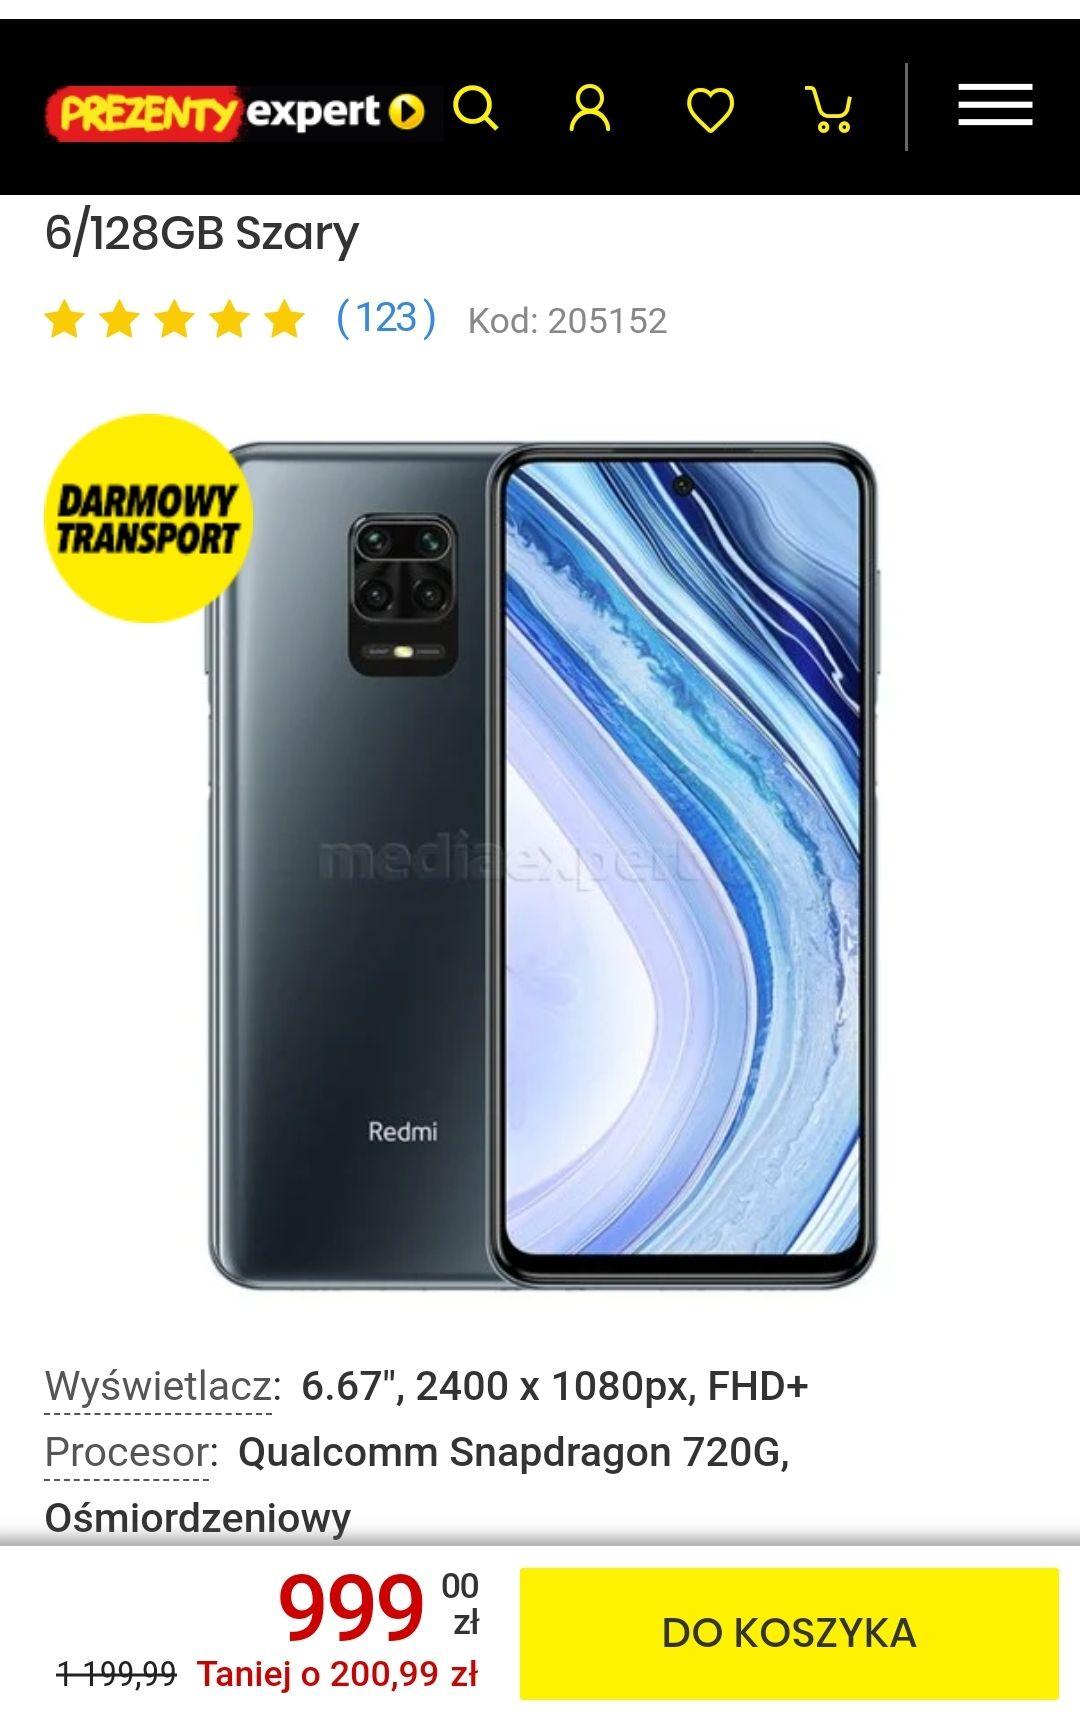 Smartfon XIAOMI Redmi Note 9 Pro 6/128GB Szary